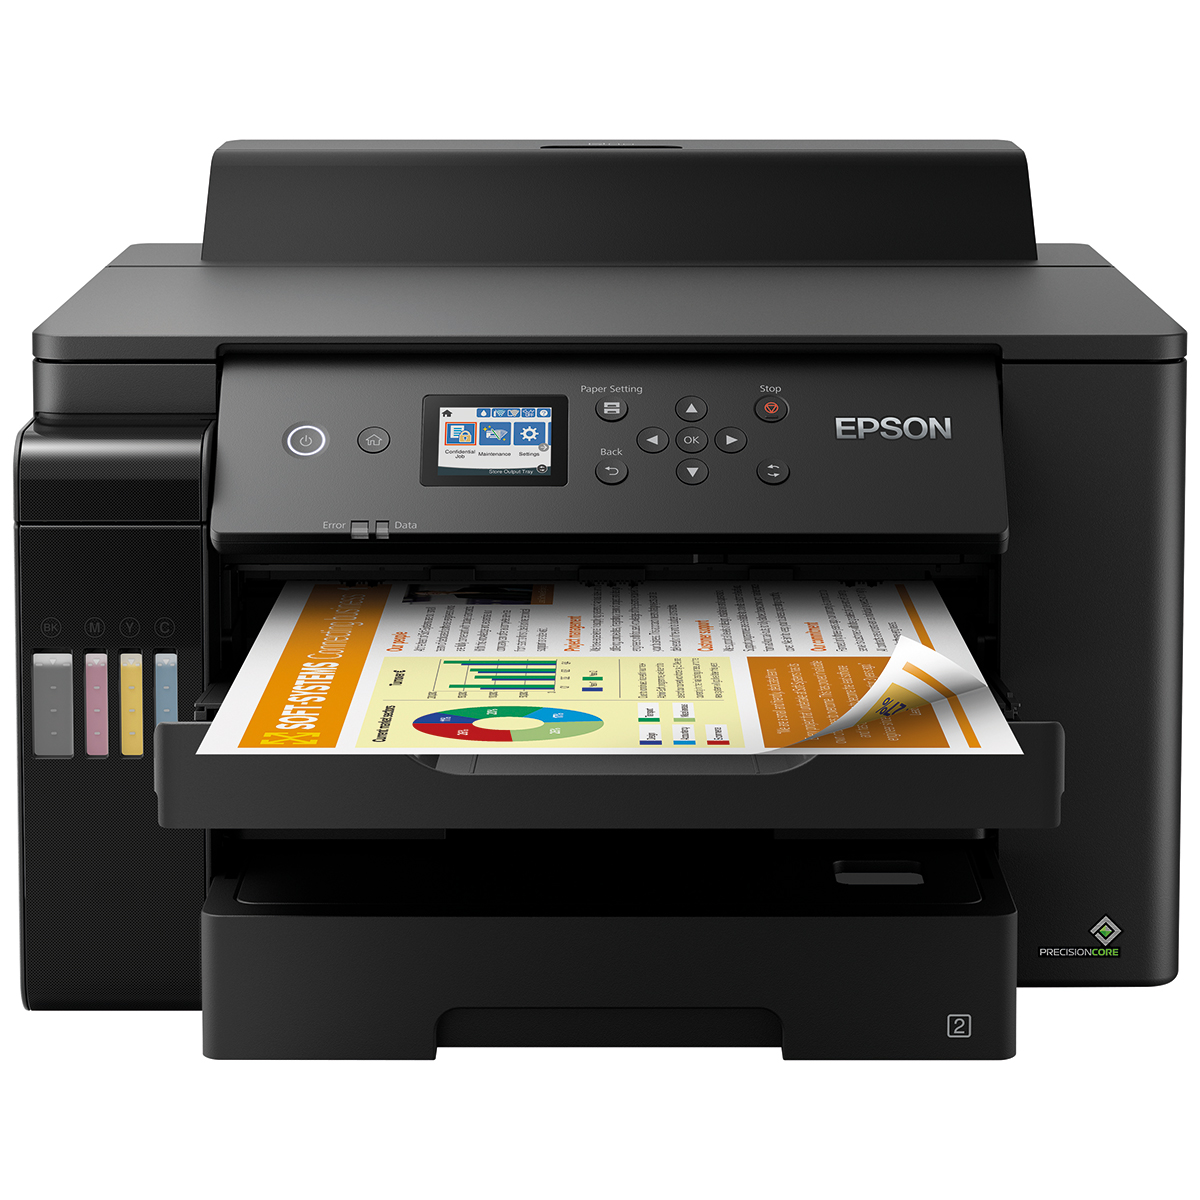 Epson EcoTank ET-16150 A3 Colour Inkjet Printer